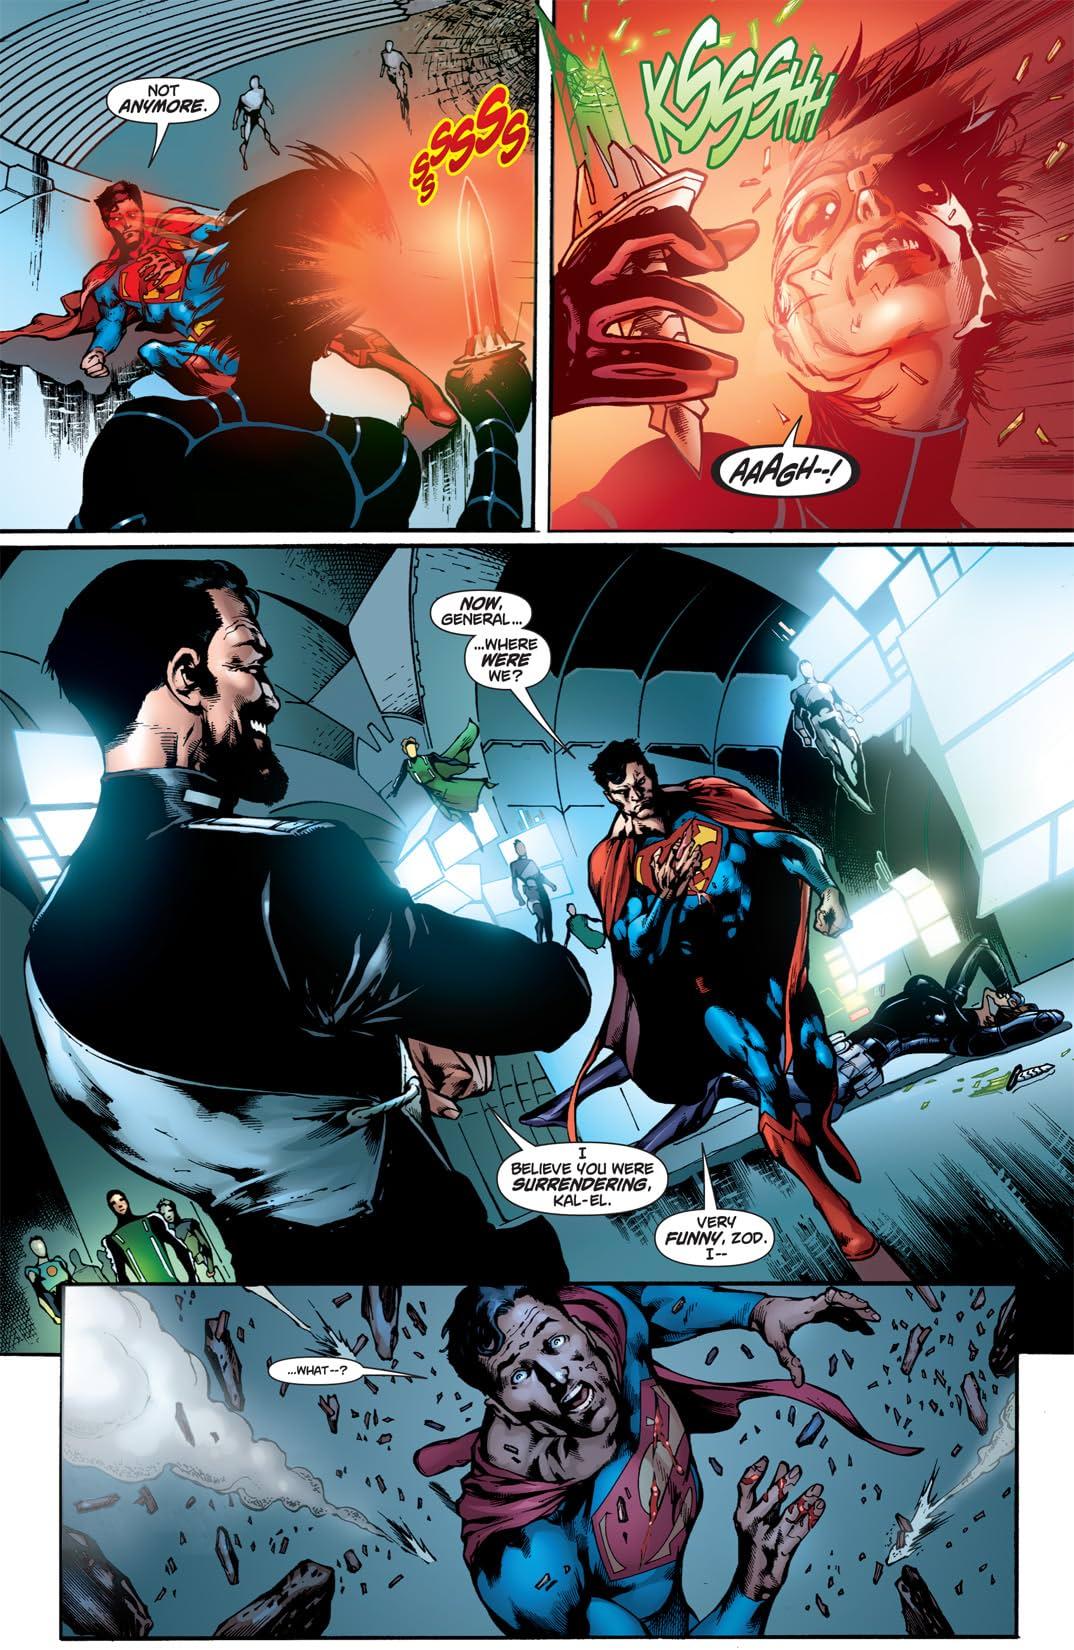 Superman: War of the Supermen #0 (of 0)